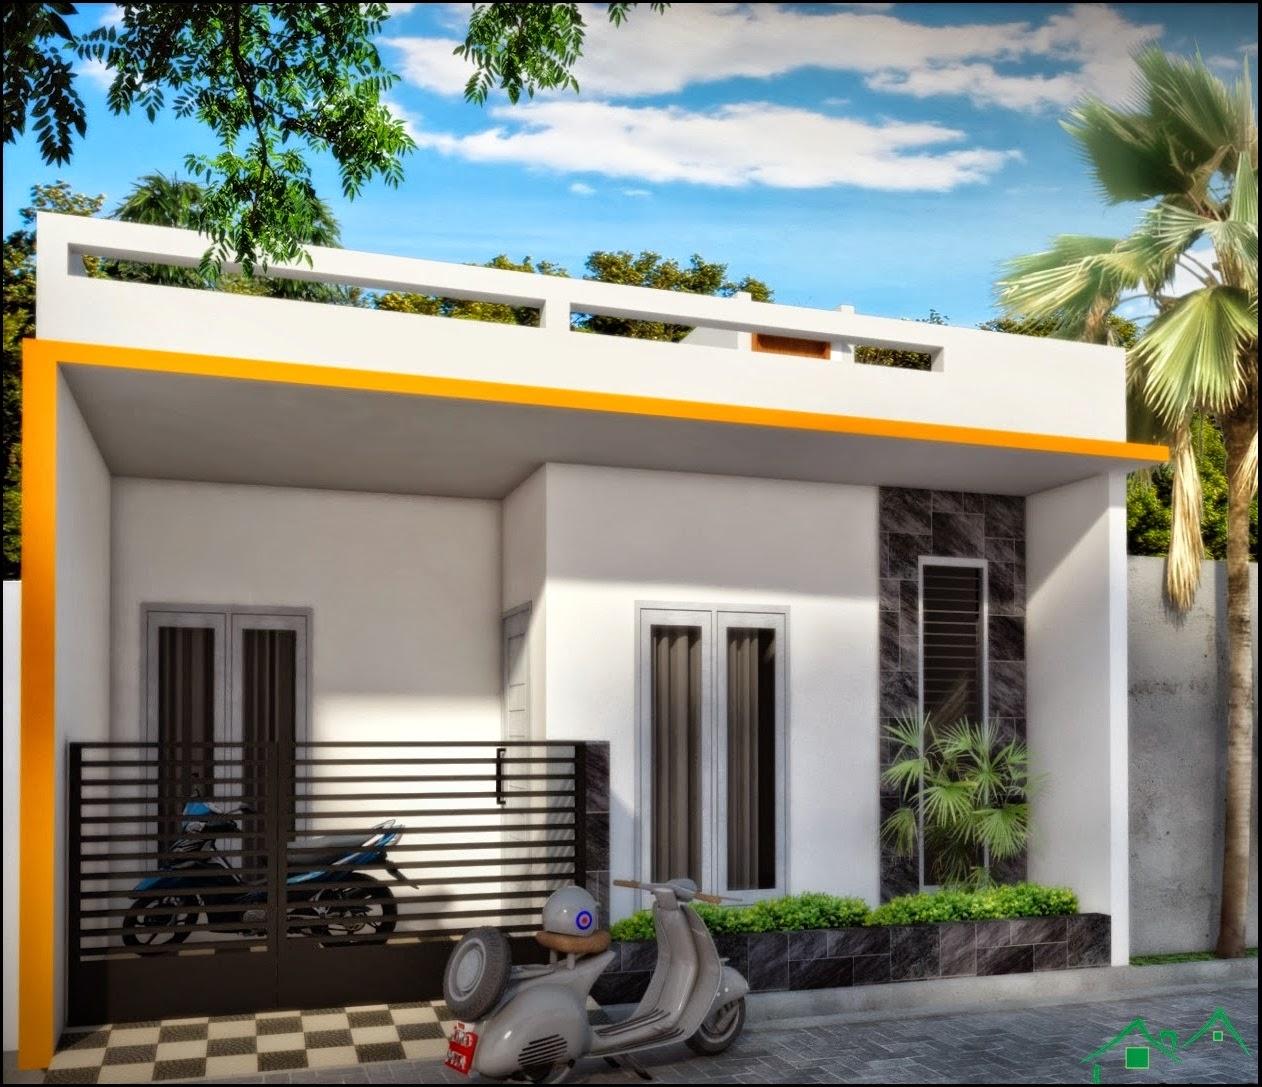 Desain Rumah Mungil Type 45 Architectaria | Huniankini